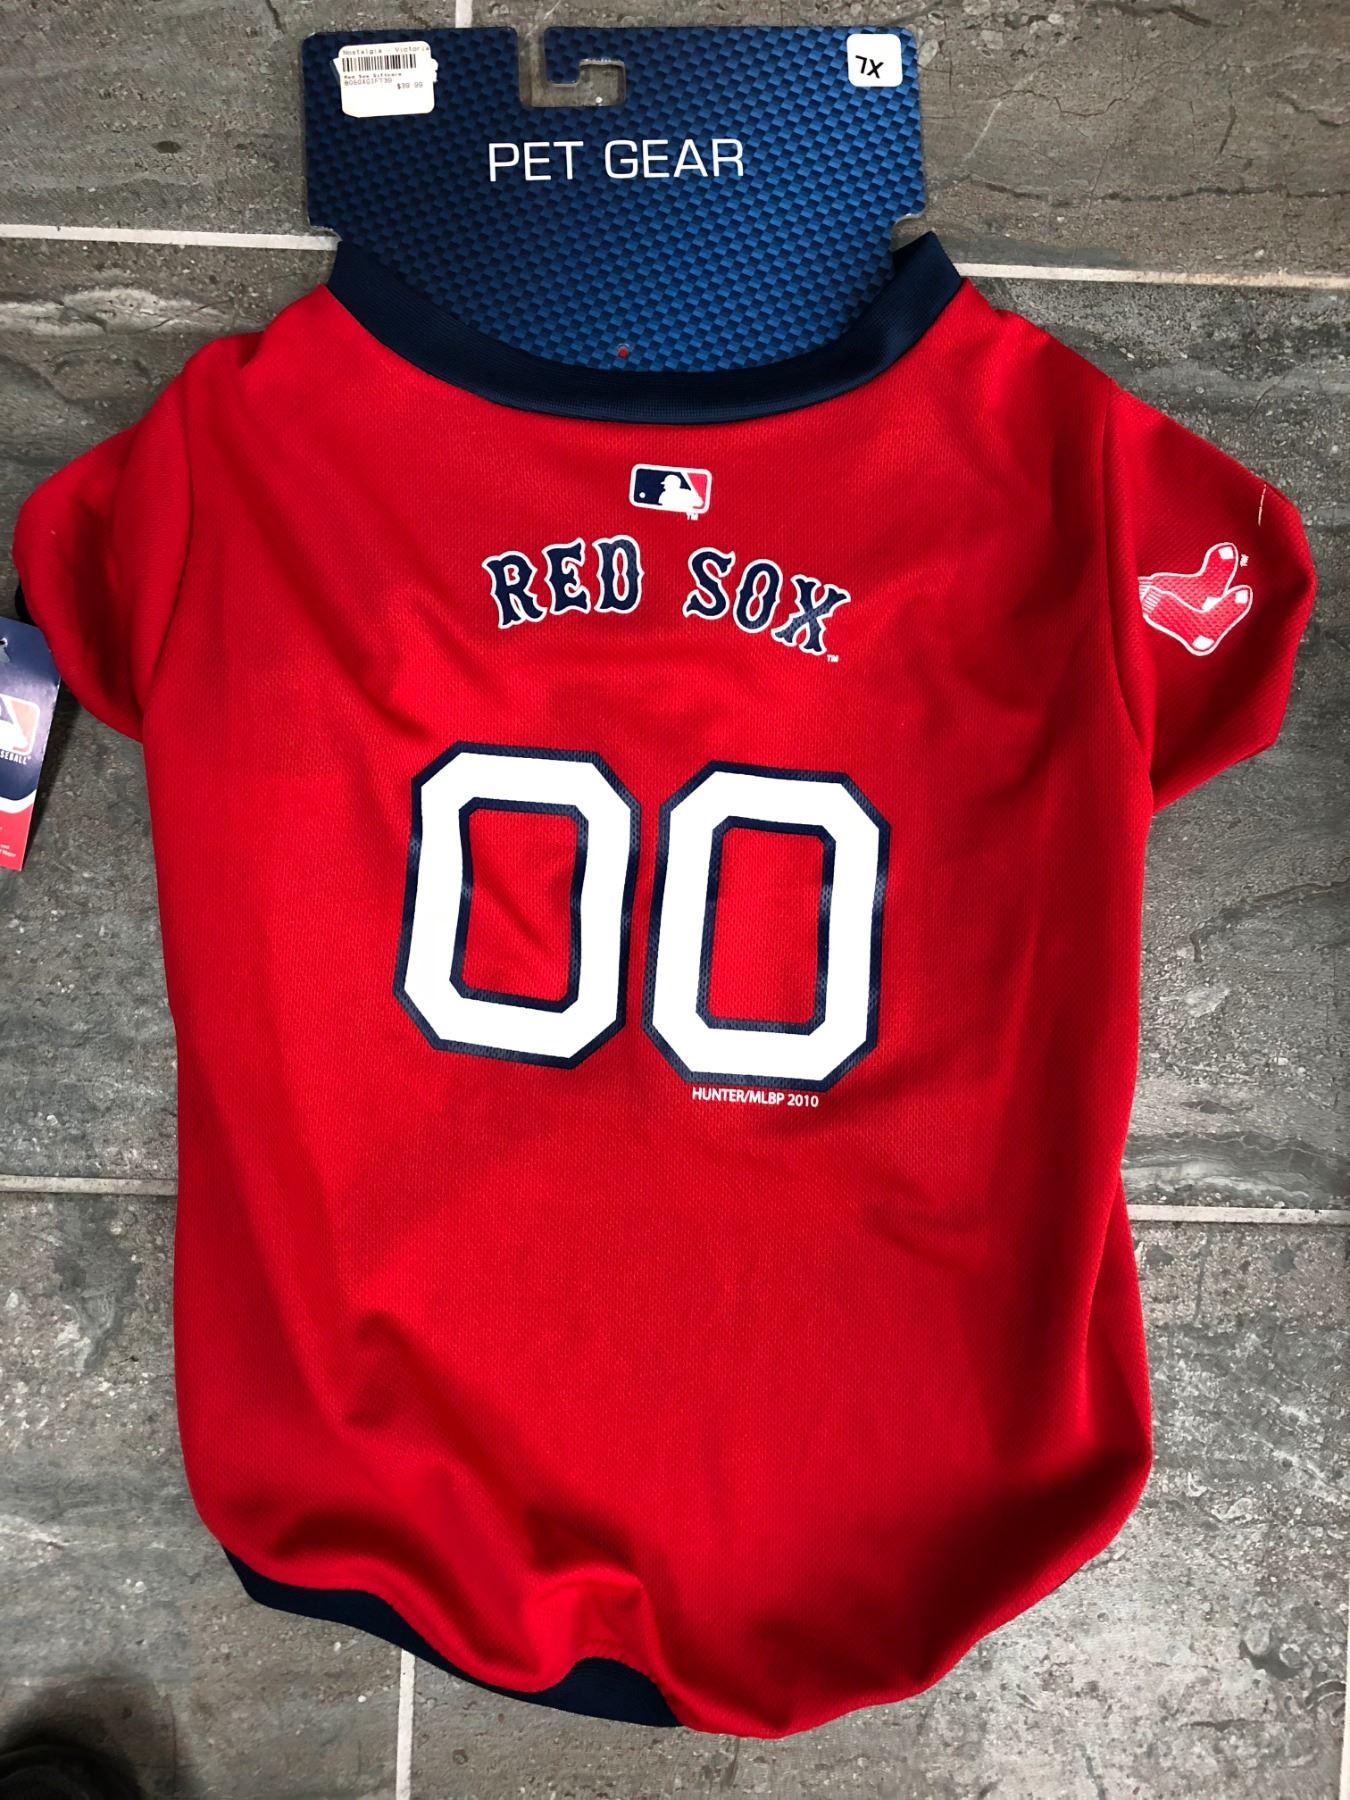 online retailer 2fcc1 c8c7d MLB BOSTON RED SOX PET GEAR